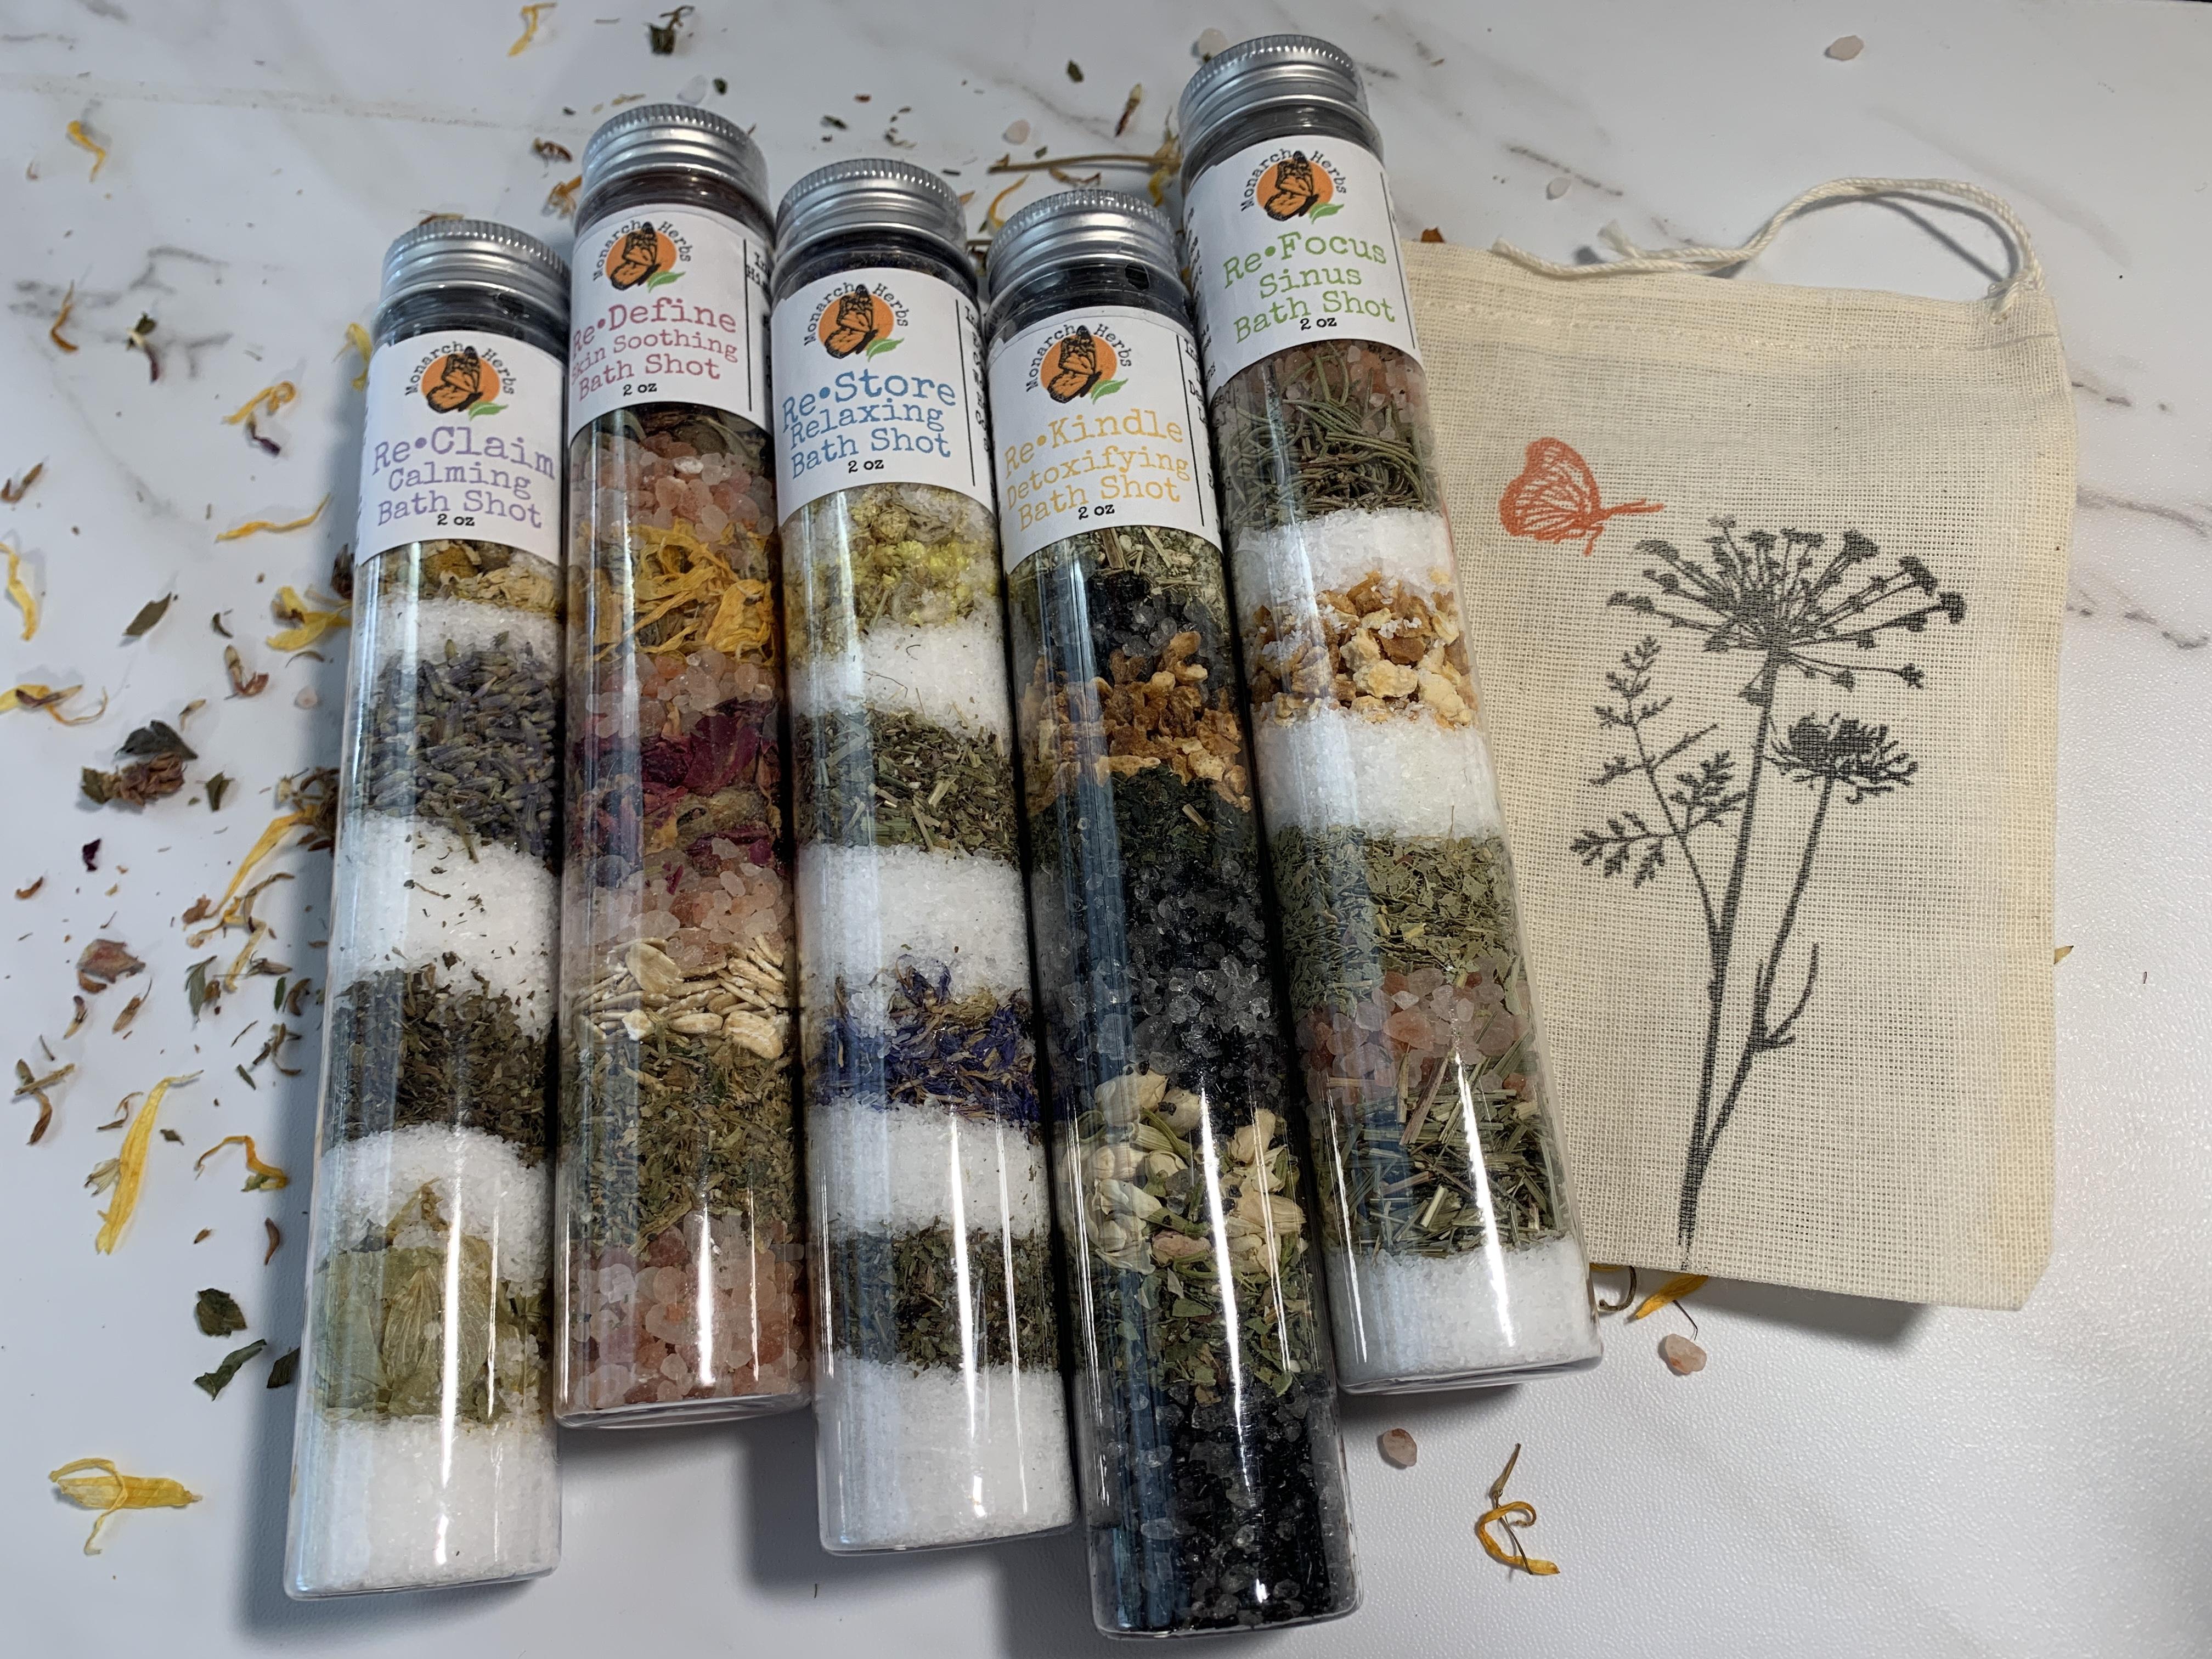 Herbal Bath Shots